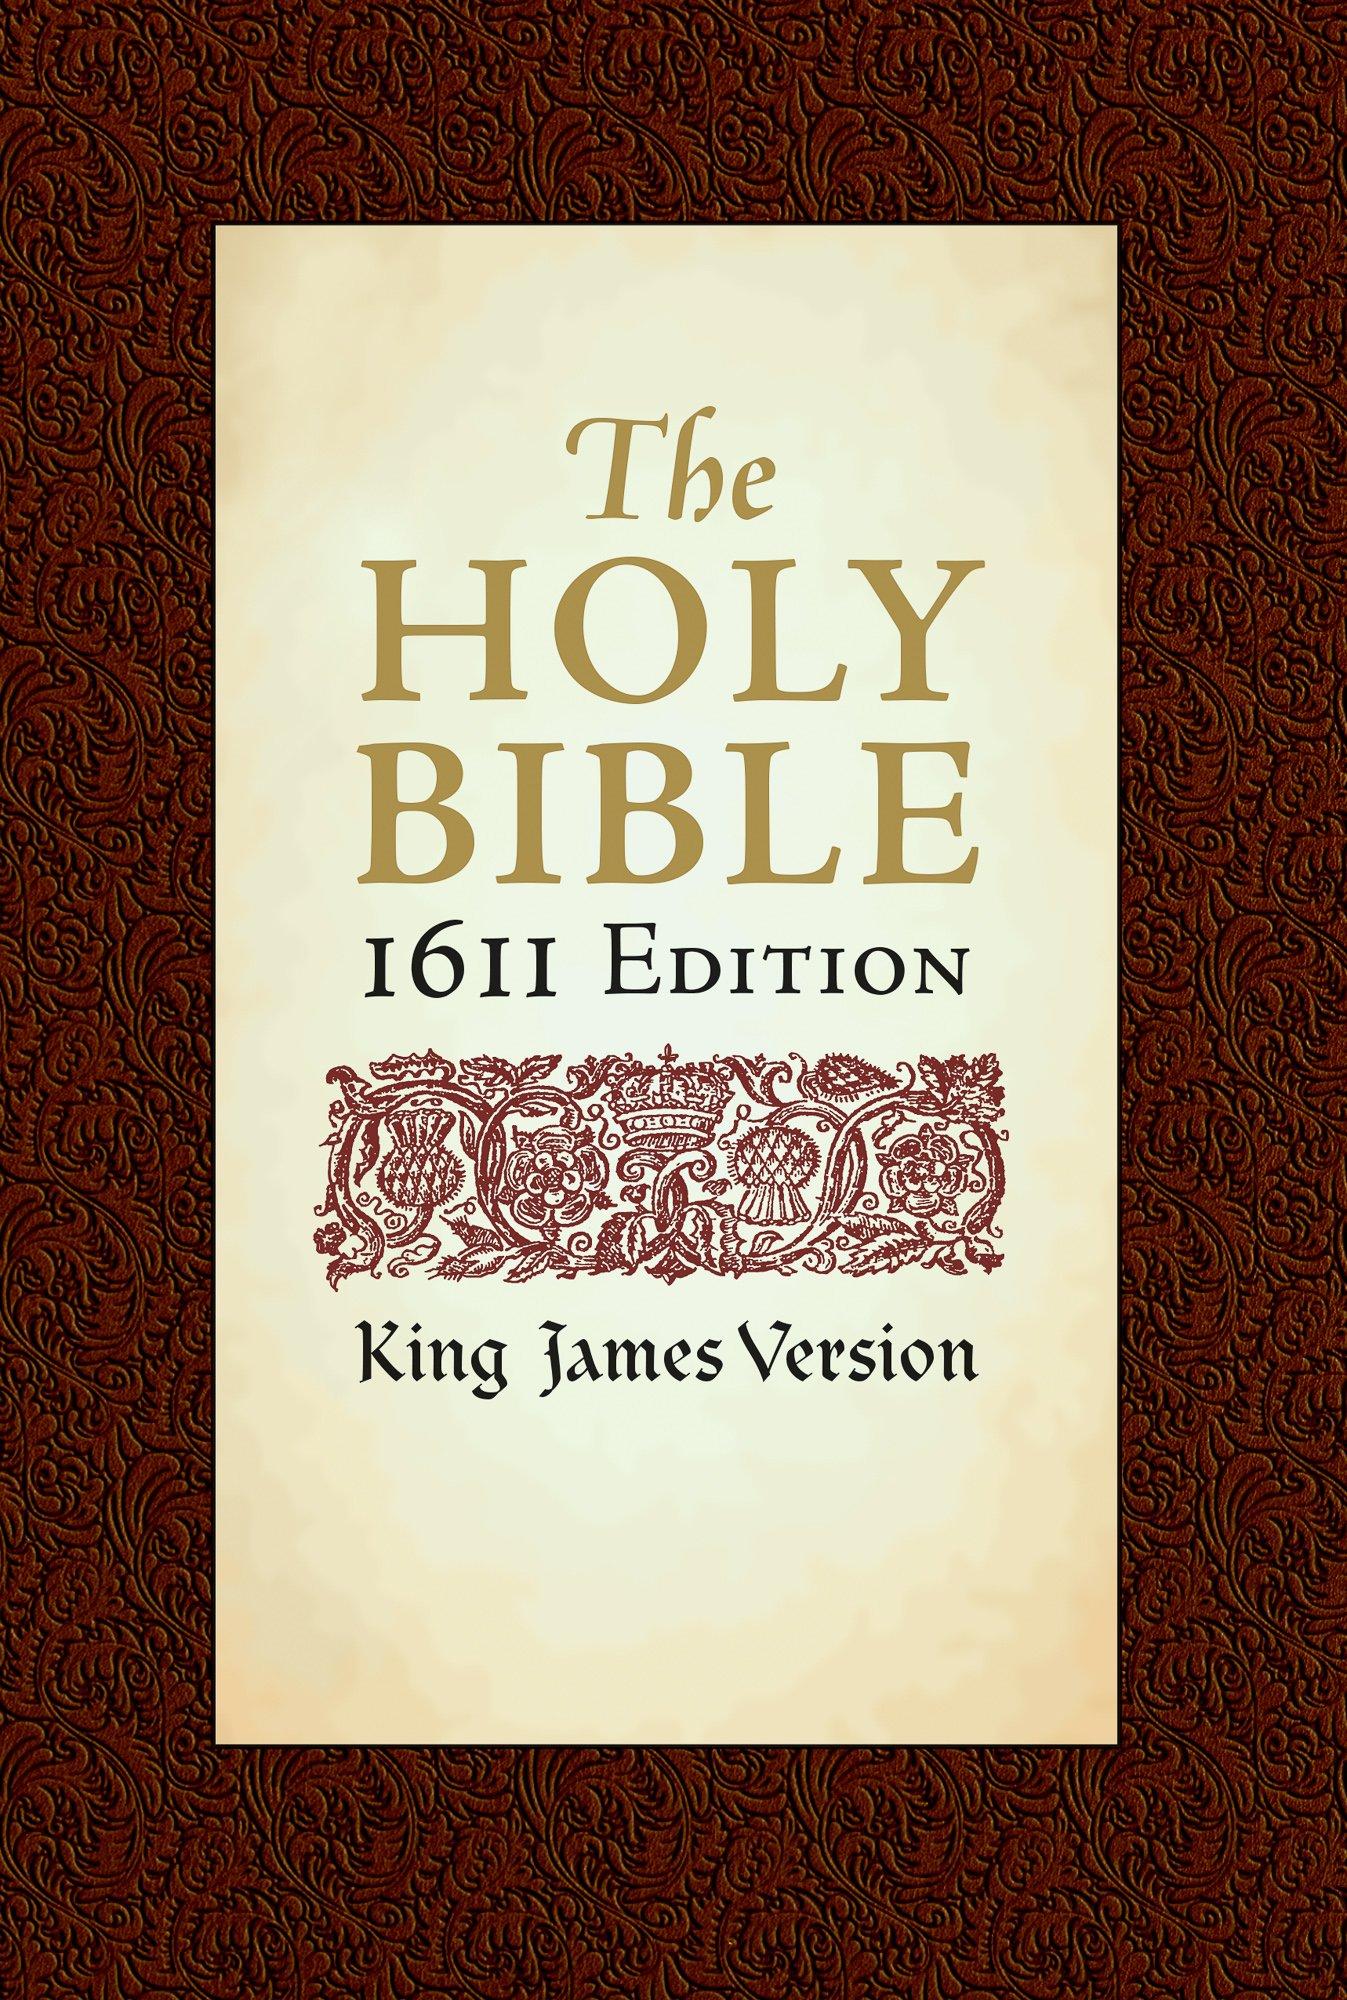 Holy Bible: King James Version, 1611 Edition: Hendrickson Publishers ...